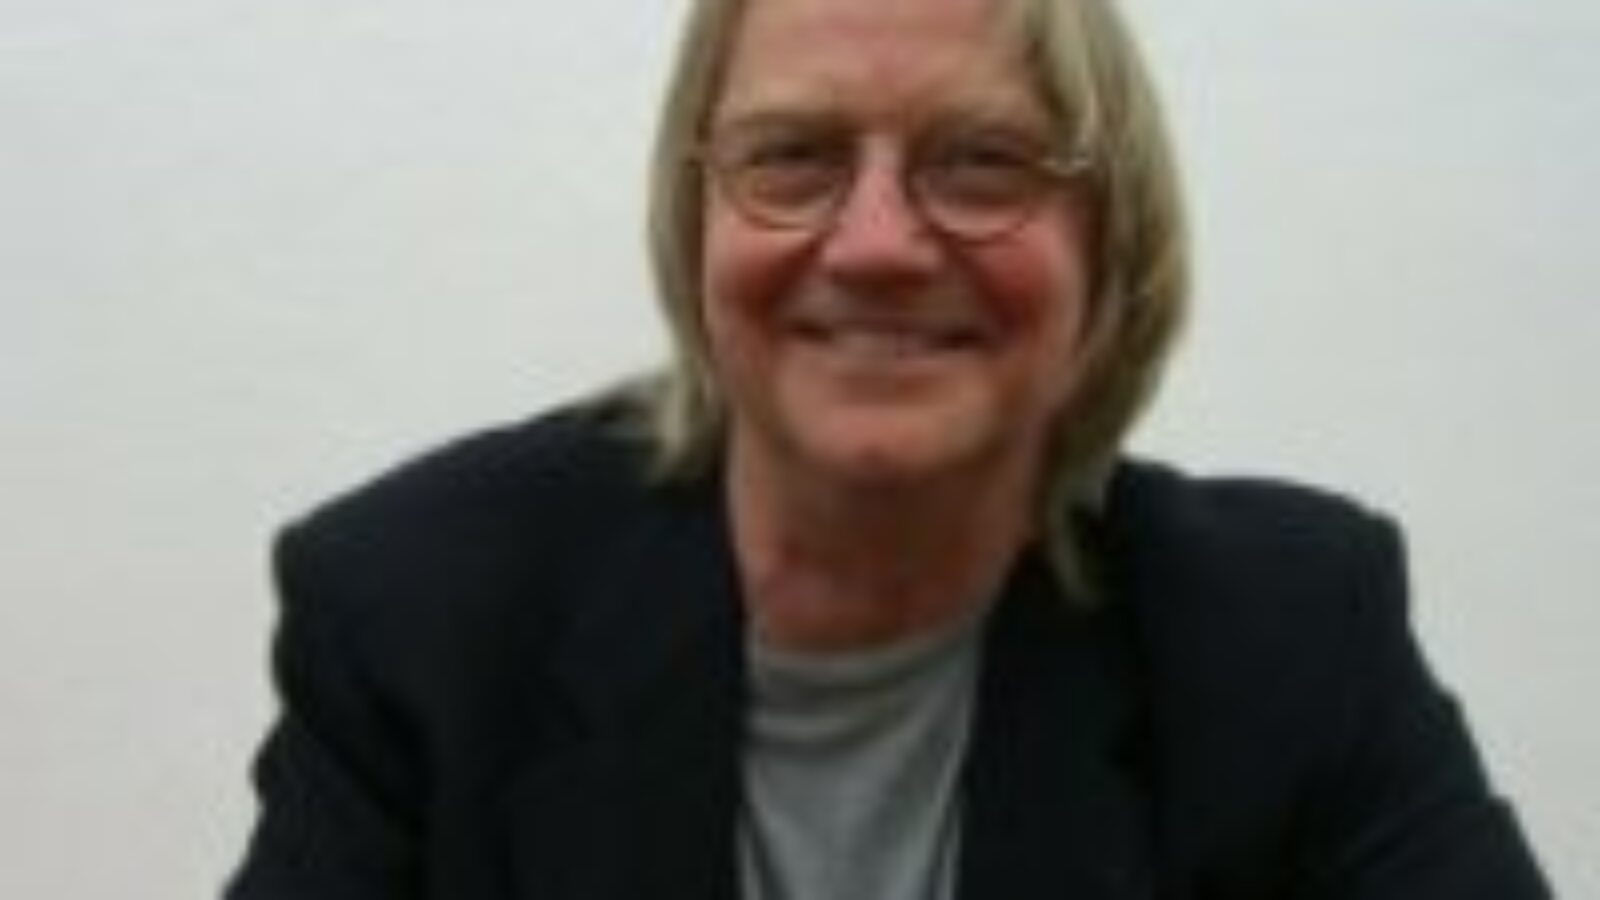 Ruhe in Frieden, Manfred Knop